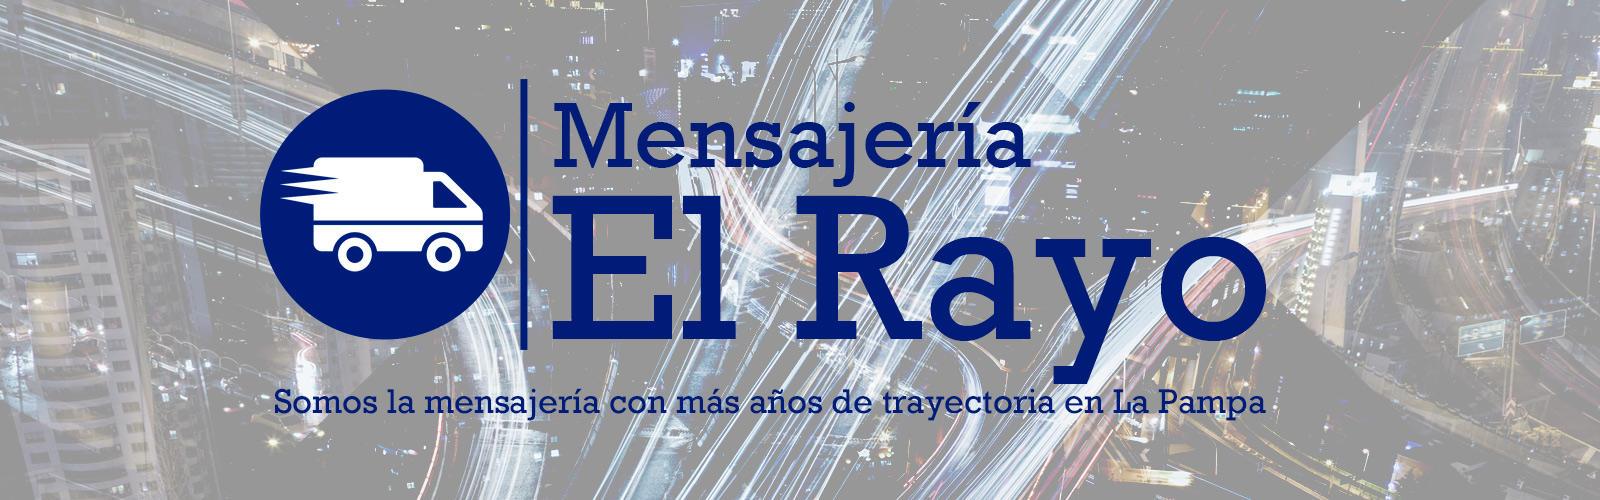 CADETERIA EL RAYO